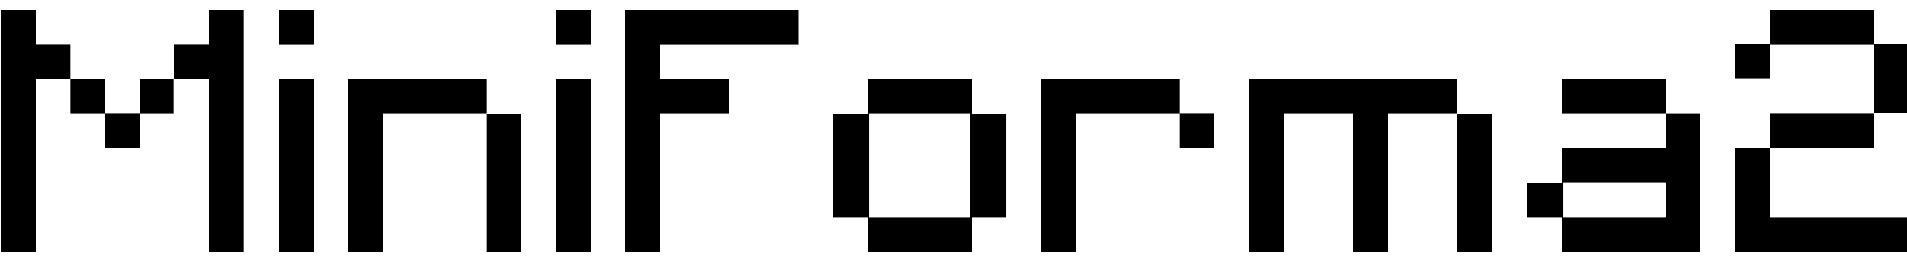 MiniForma2